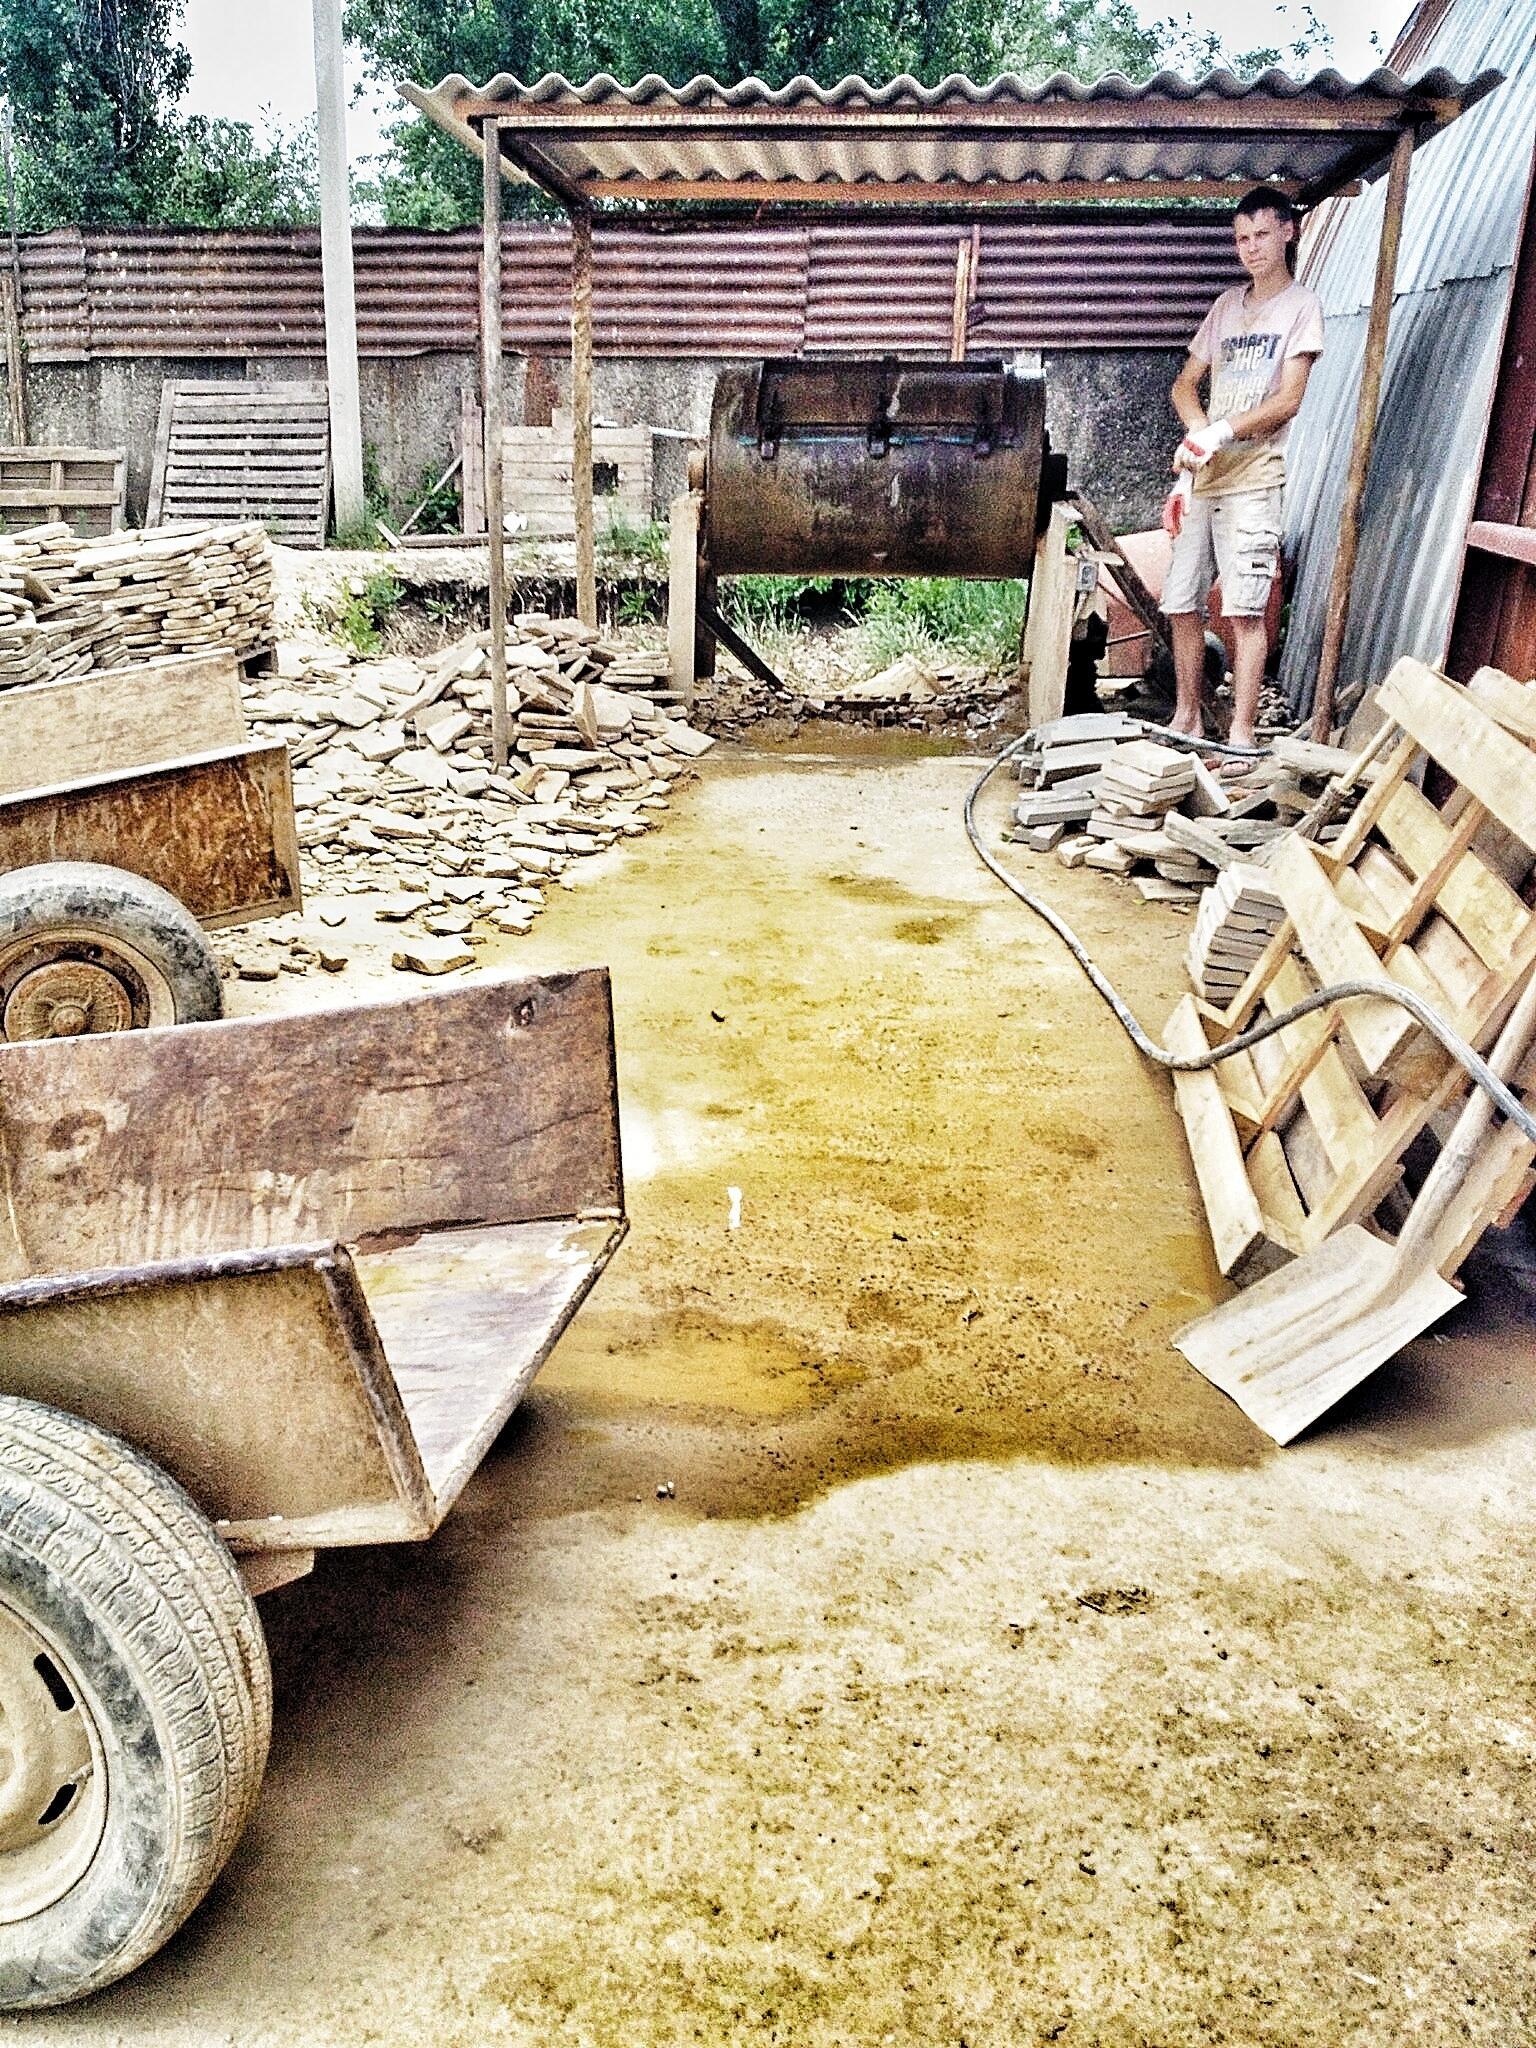 Оператор пьяной бочки * #песчаник #Айташ #Крым http://t.co/Sliho9Sq9T